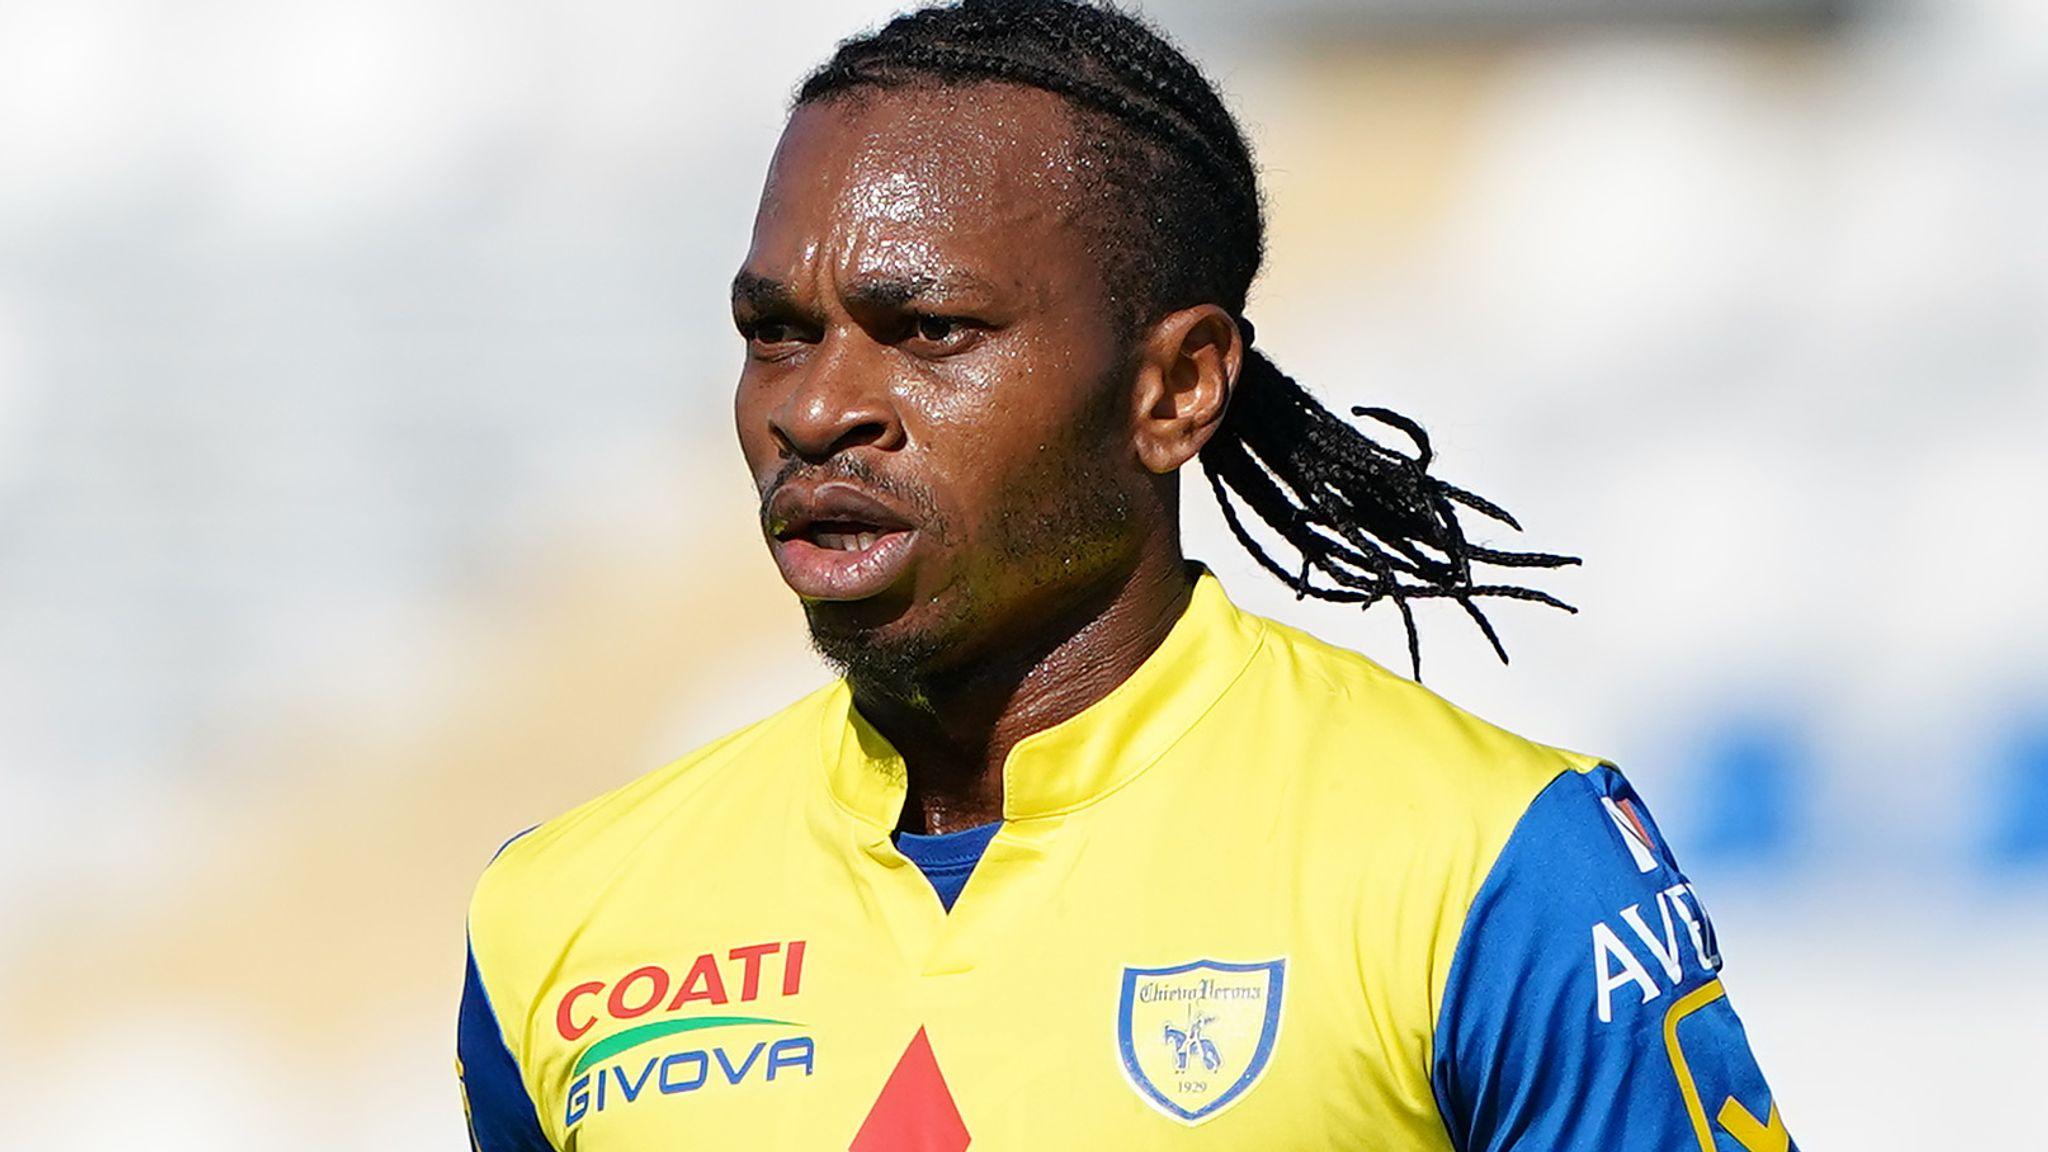 Italian striker Michele Marconi gets 10 match ban for using racial slurs on Joel Obi